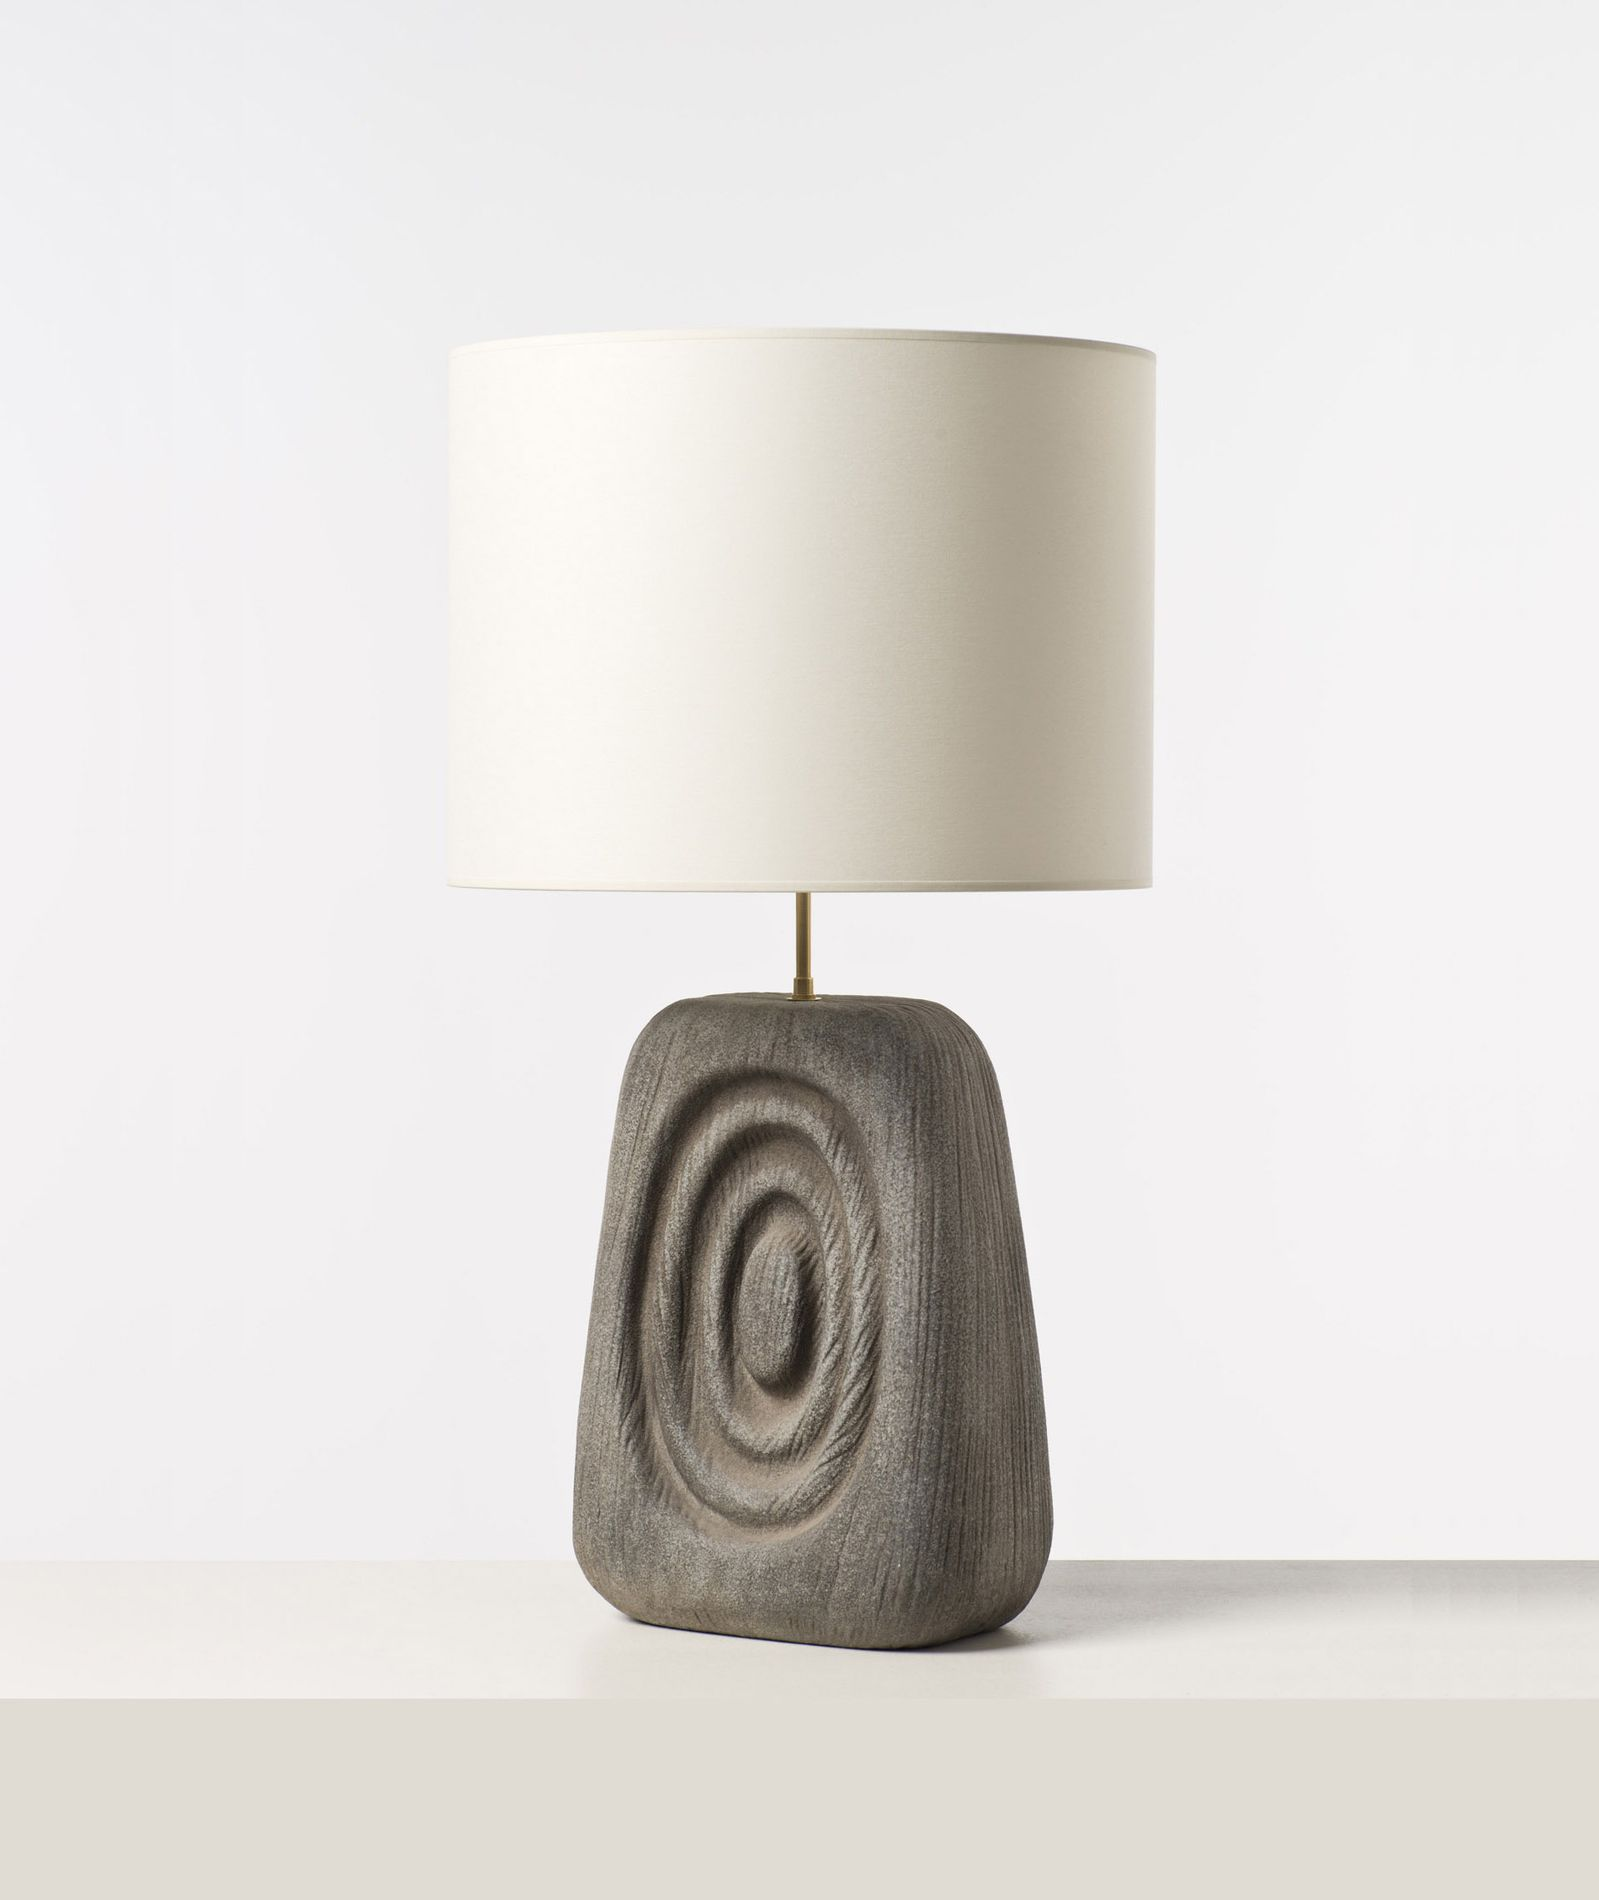 Marcello Fantoni Glazed Ceramic Table Lamp C1960 Ceramic Table Lamps Table Lamp Floor Lamp